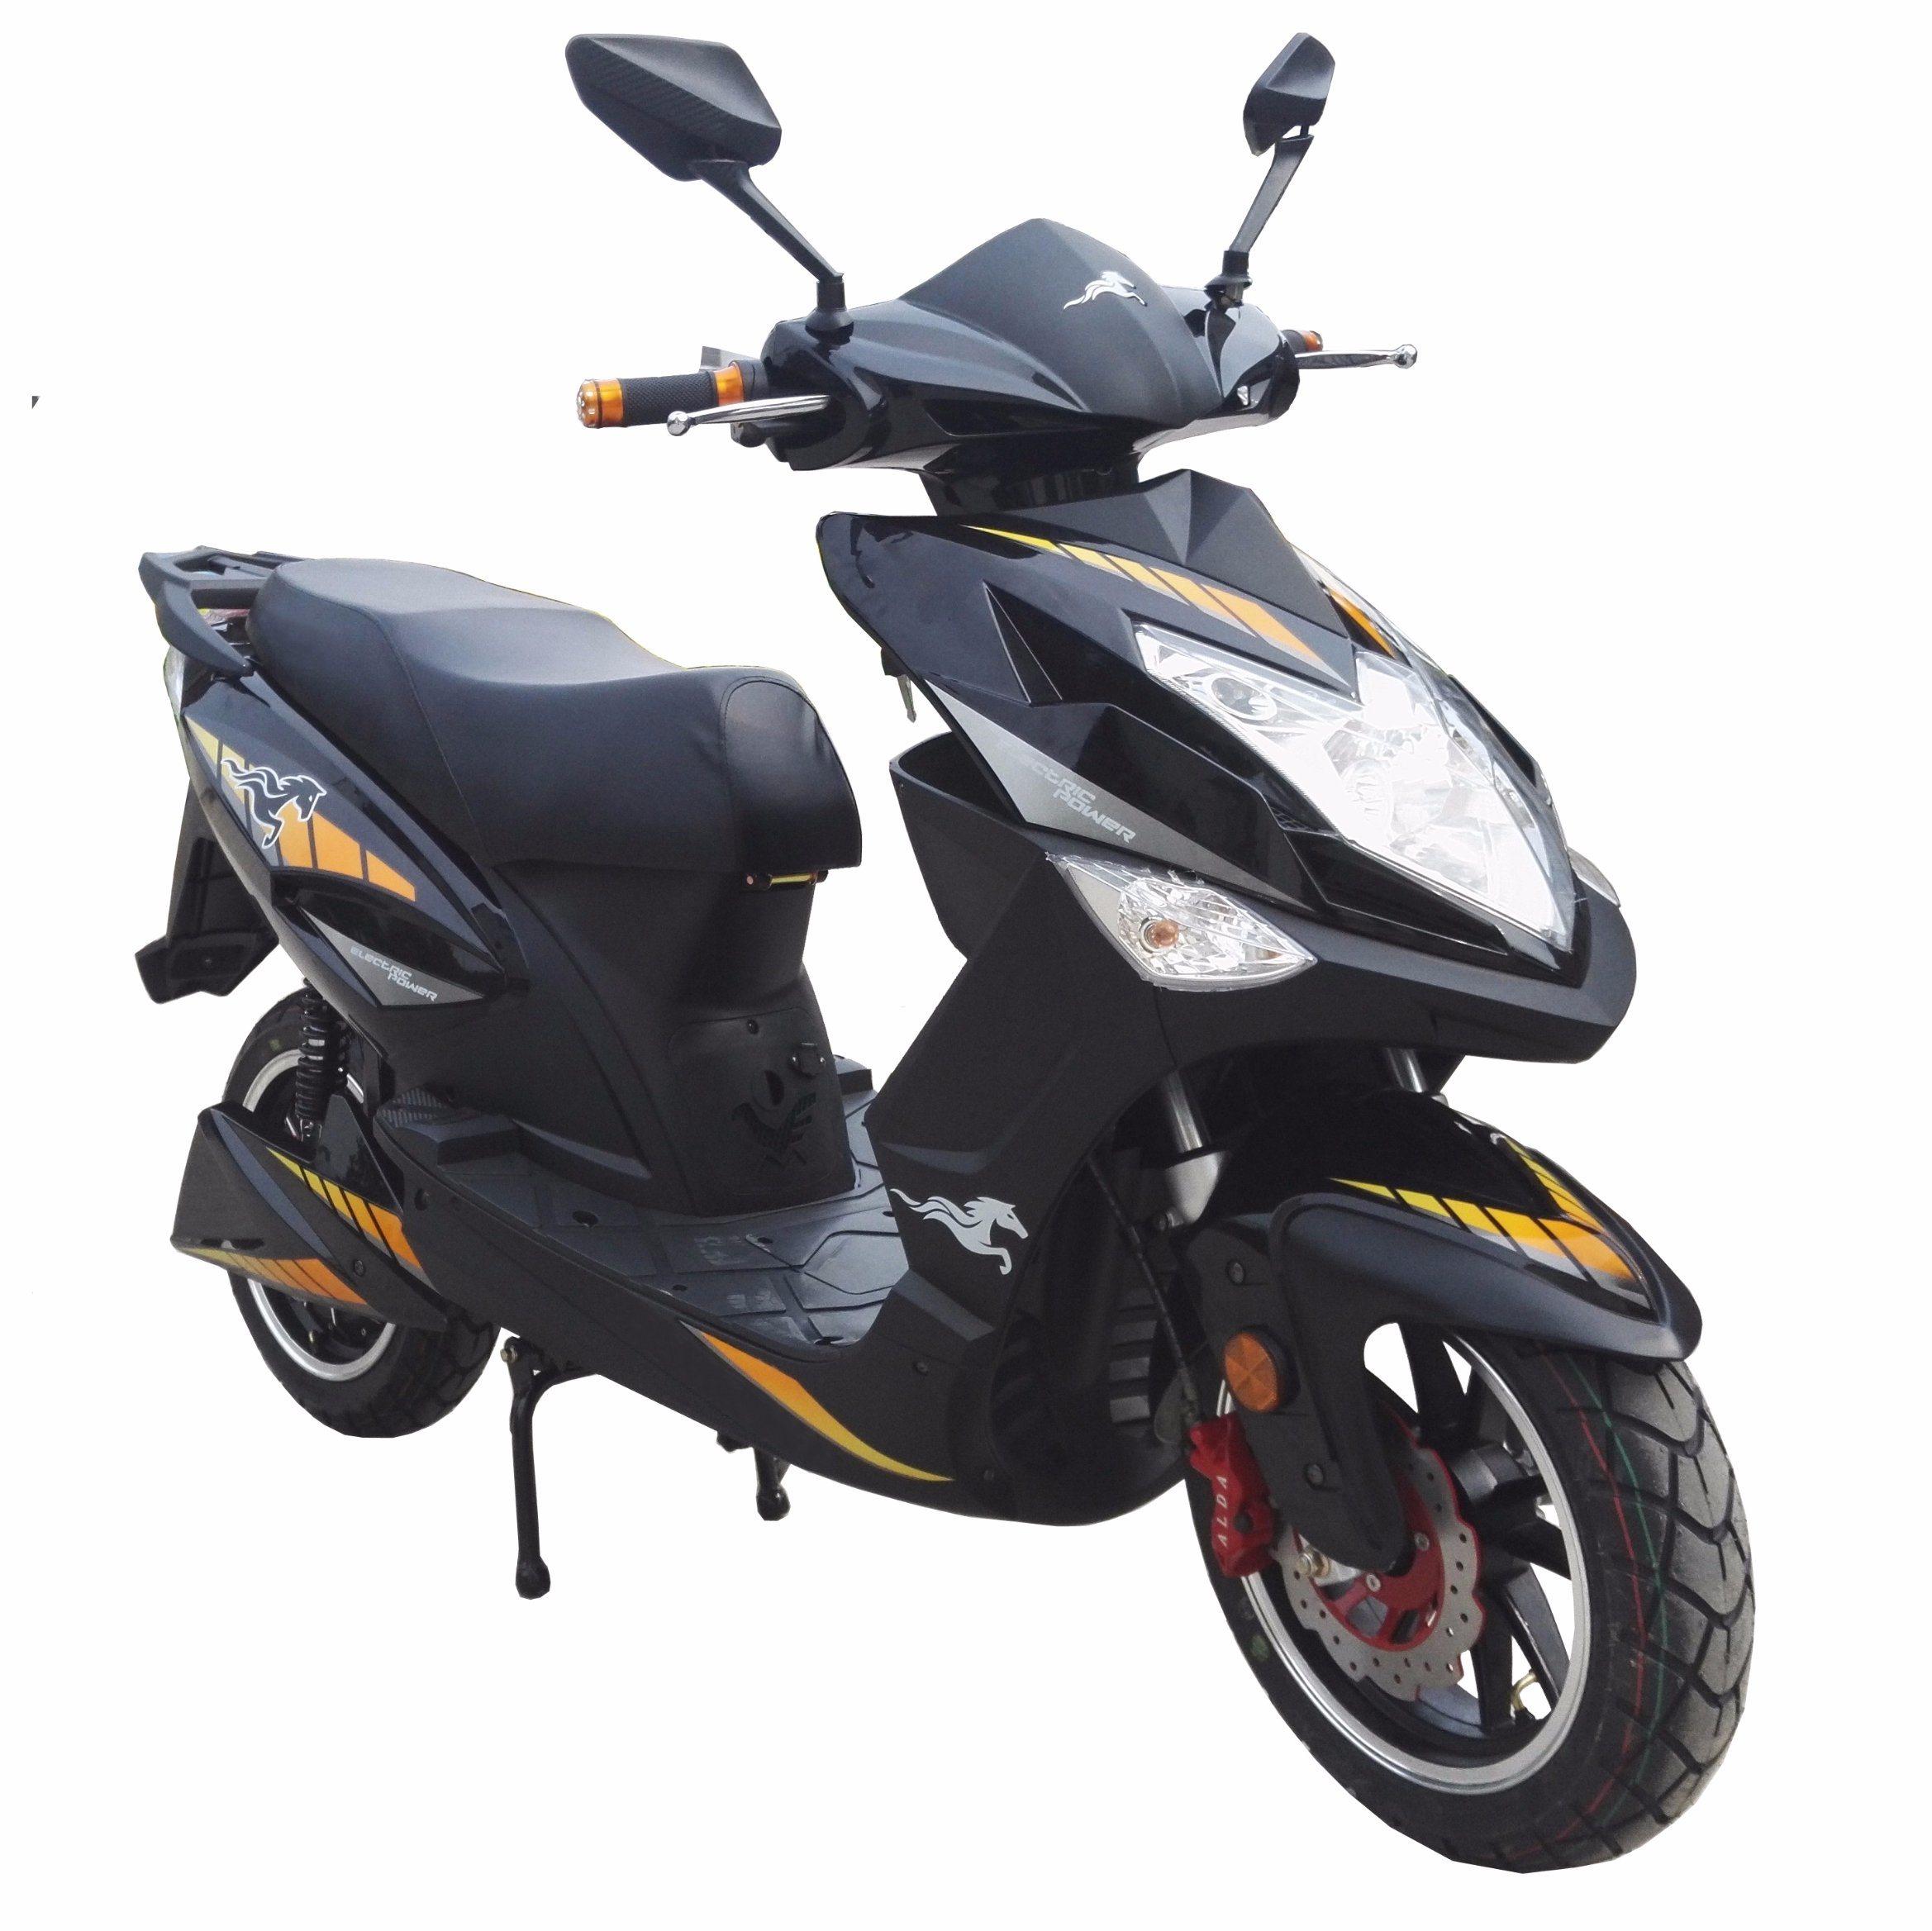 2017 South America Cuba Panama Market Hot Sales 1000W/1500W/2000W 72V20ah Lead Acid/Lithium Battery Electric Motorcycle